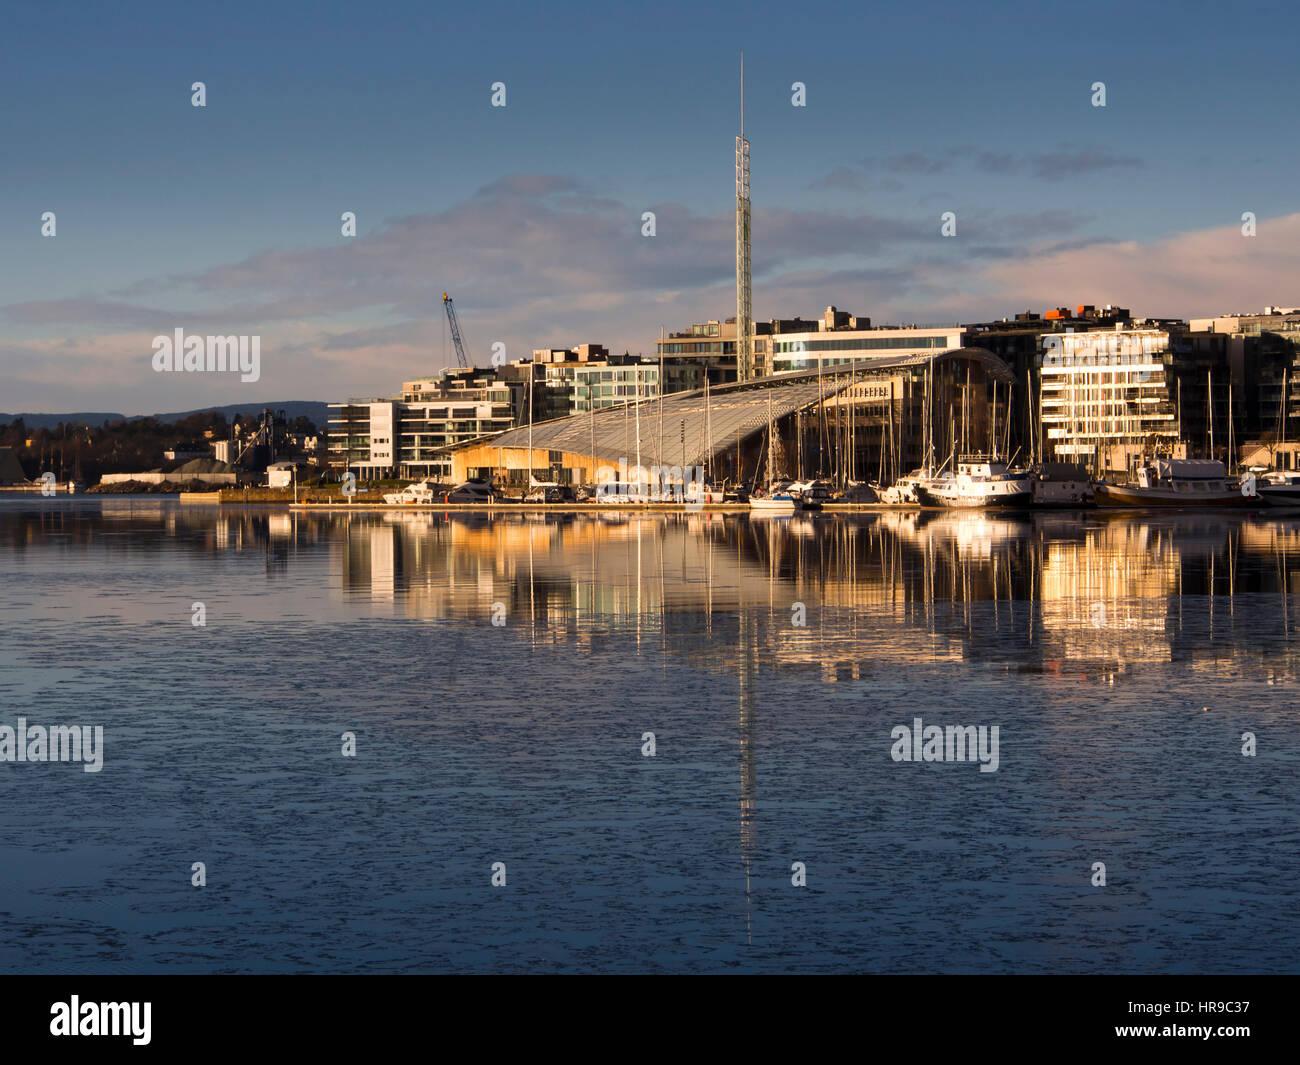 Tjuvholmen und Aker Brygge am Fjord in Oslo Norwegen dominiert die markante Architektur des Astrup Fearnley Museum Stockbild